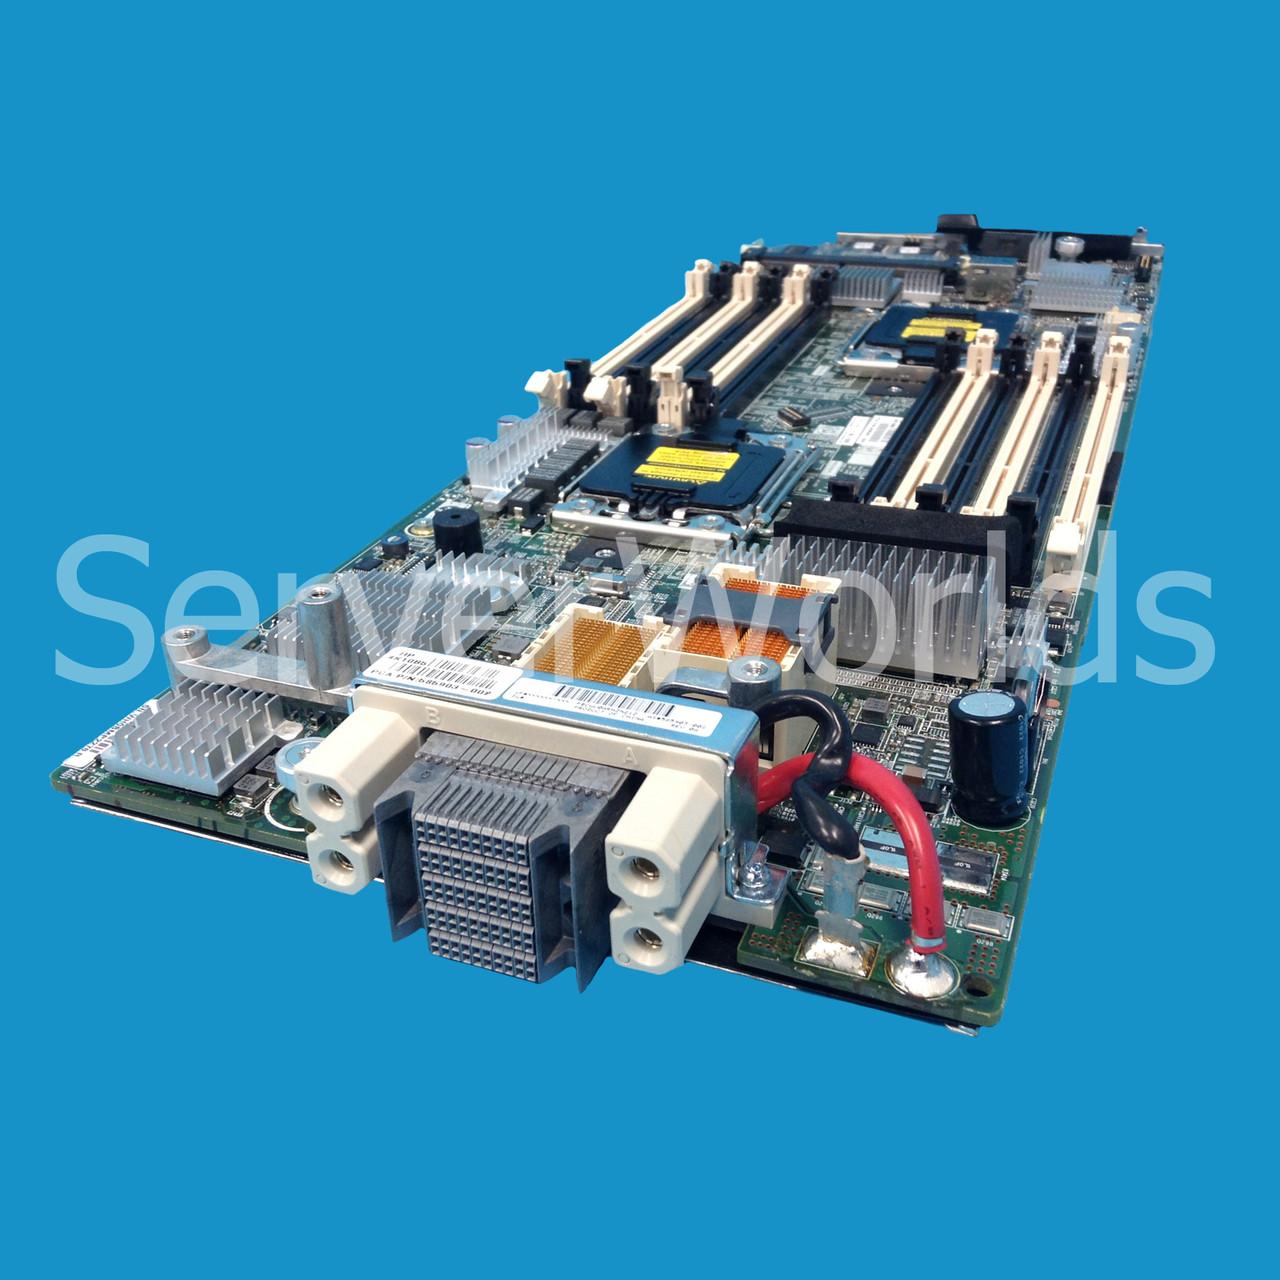 HP 595046-001 BL460c G6 System Board 585903-002